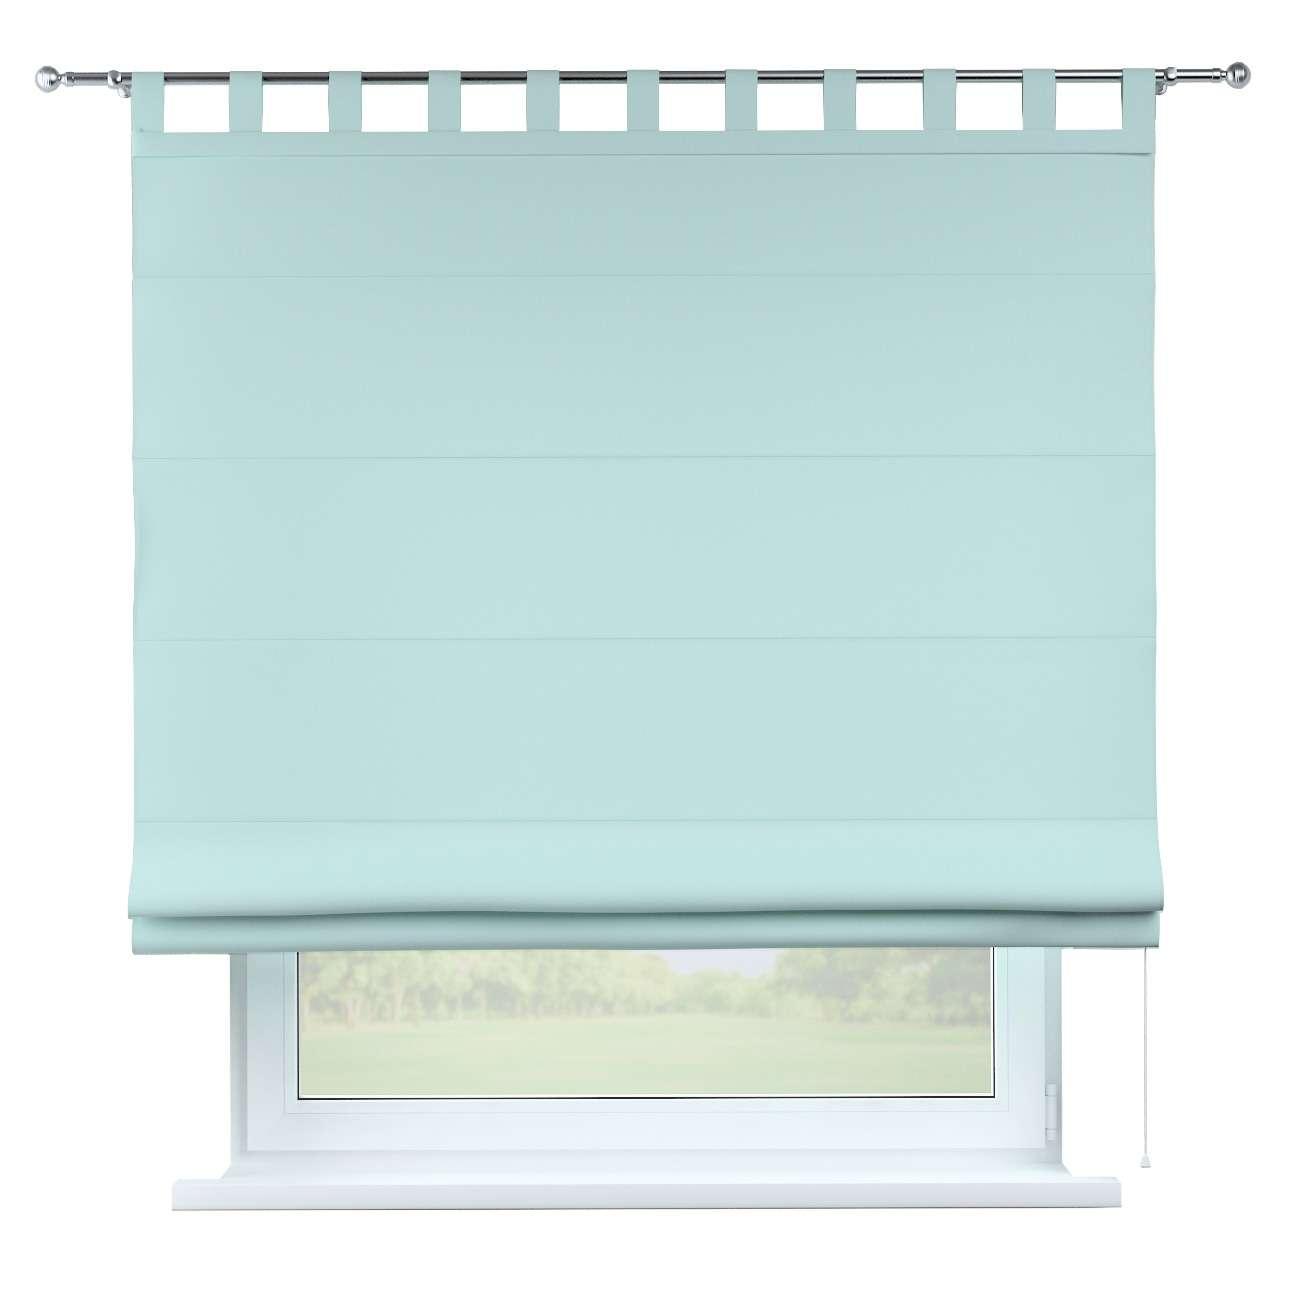 Raffrollo Verona, hellblau, 130 × 170 cm, Cotton Panama | Heimtextilien > Jalousien und Rollos > Raffrollos | Dekoria